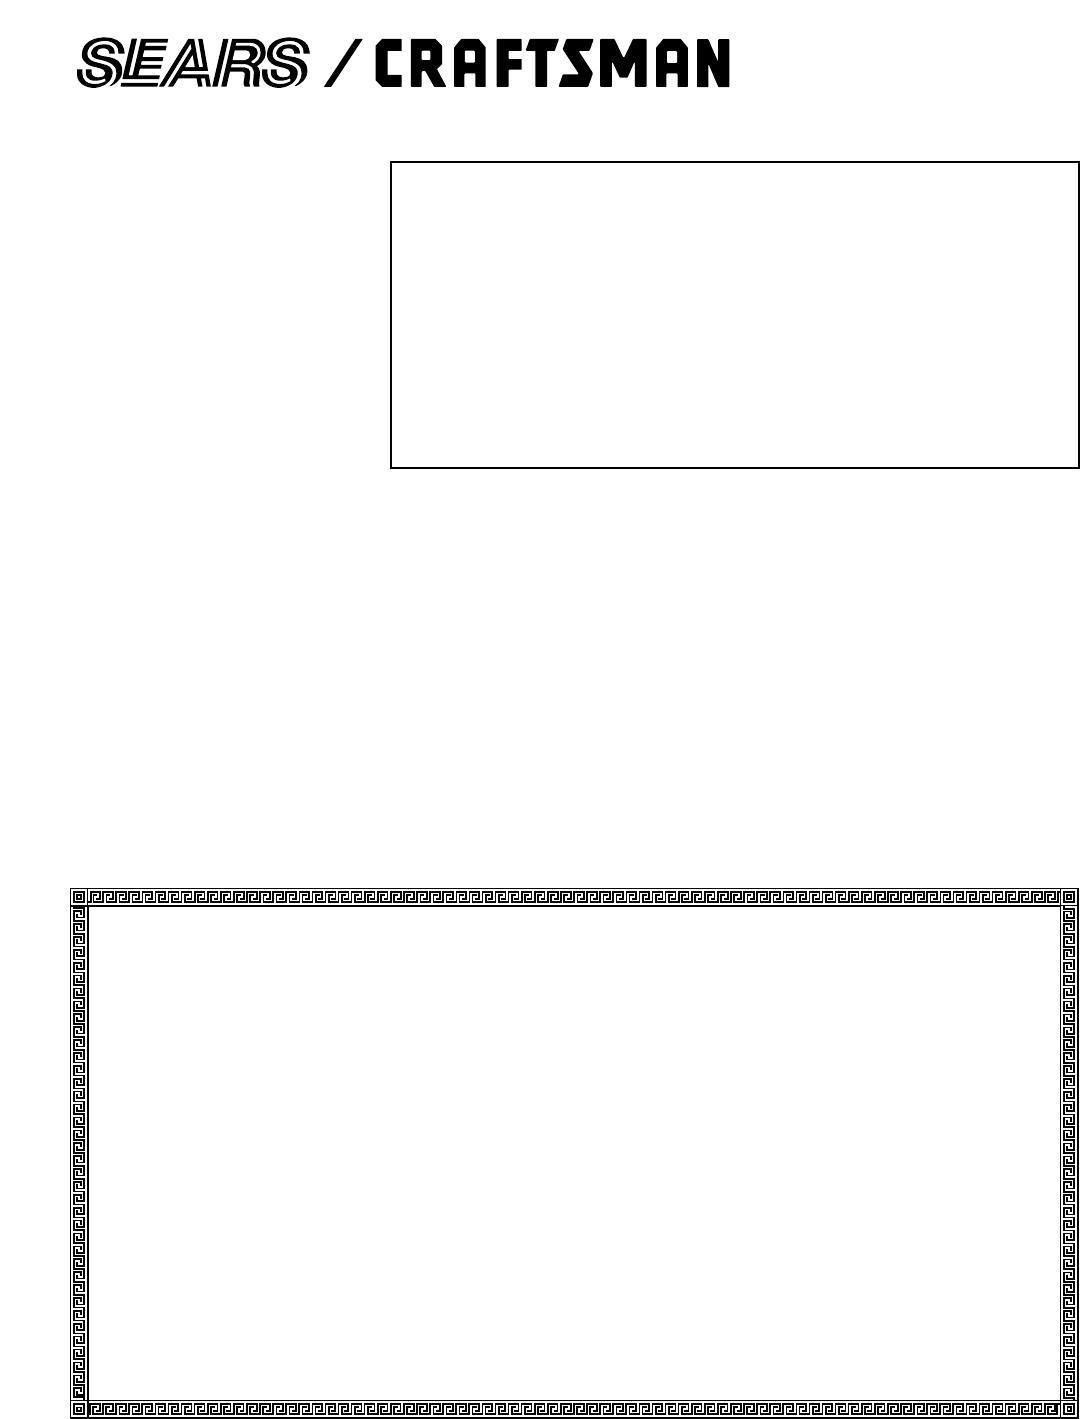 Sears Craftsman 139 18803 1 3 Hp 139 18805 1 2 Hp 139